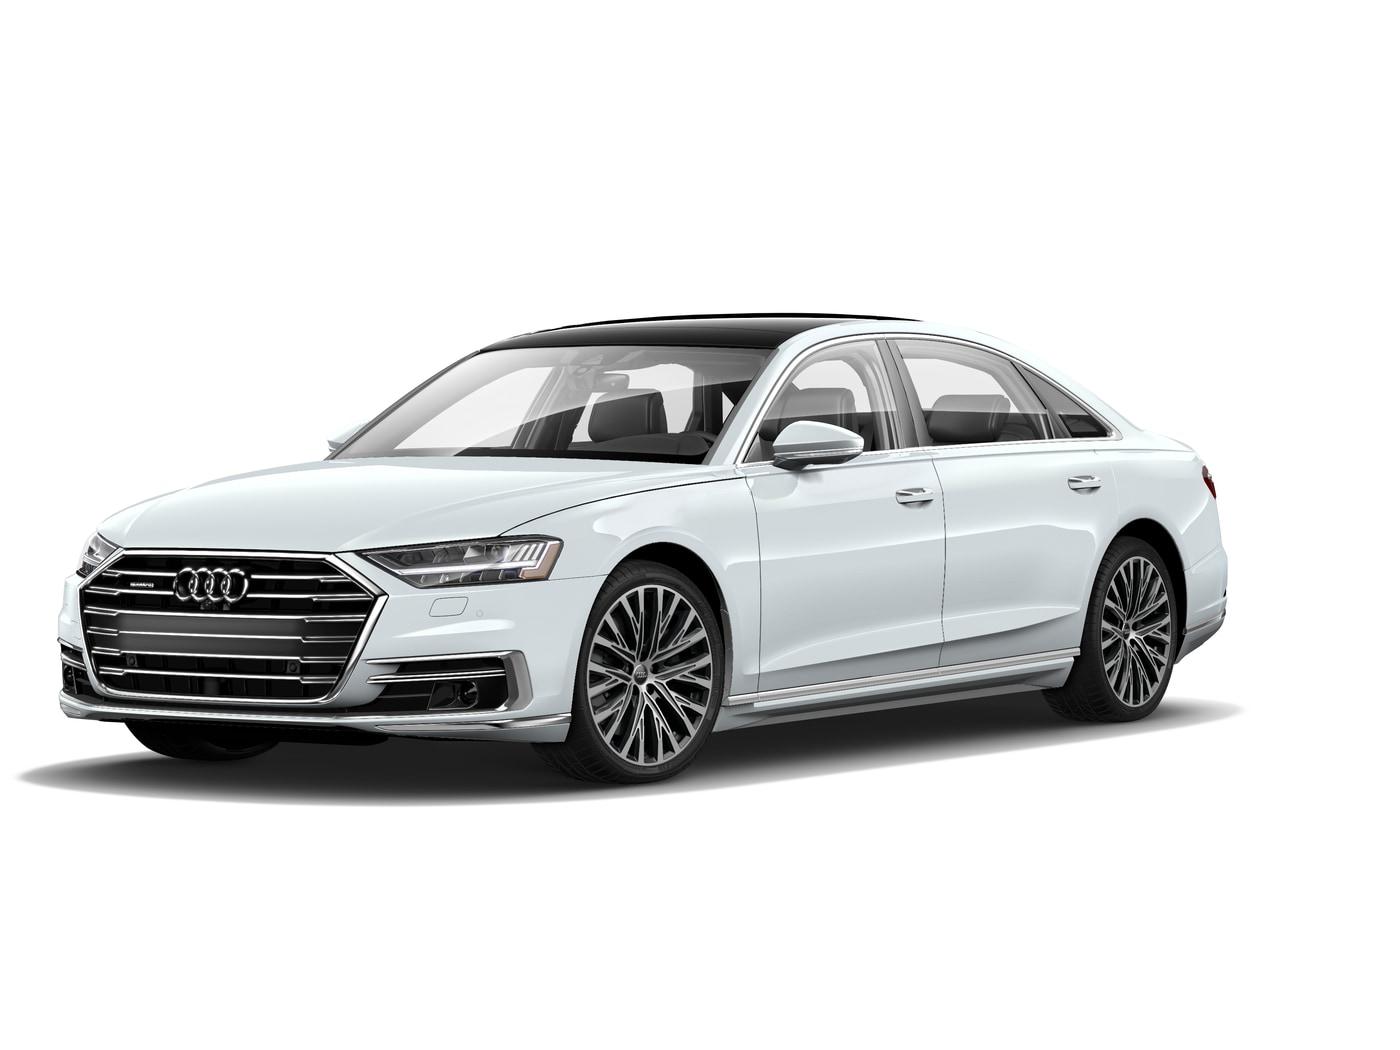 New 2019 Audi A8 L 3.0T Sedan Columbia, South Carolina